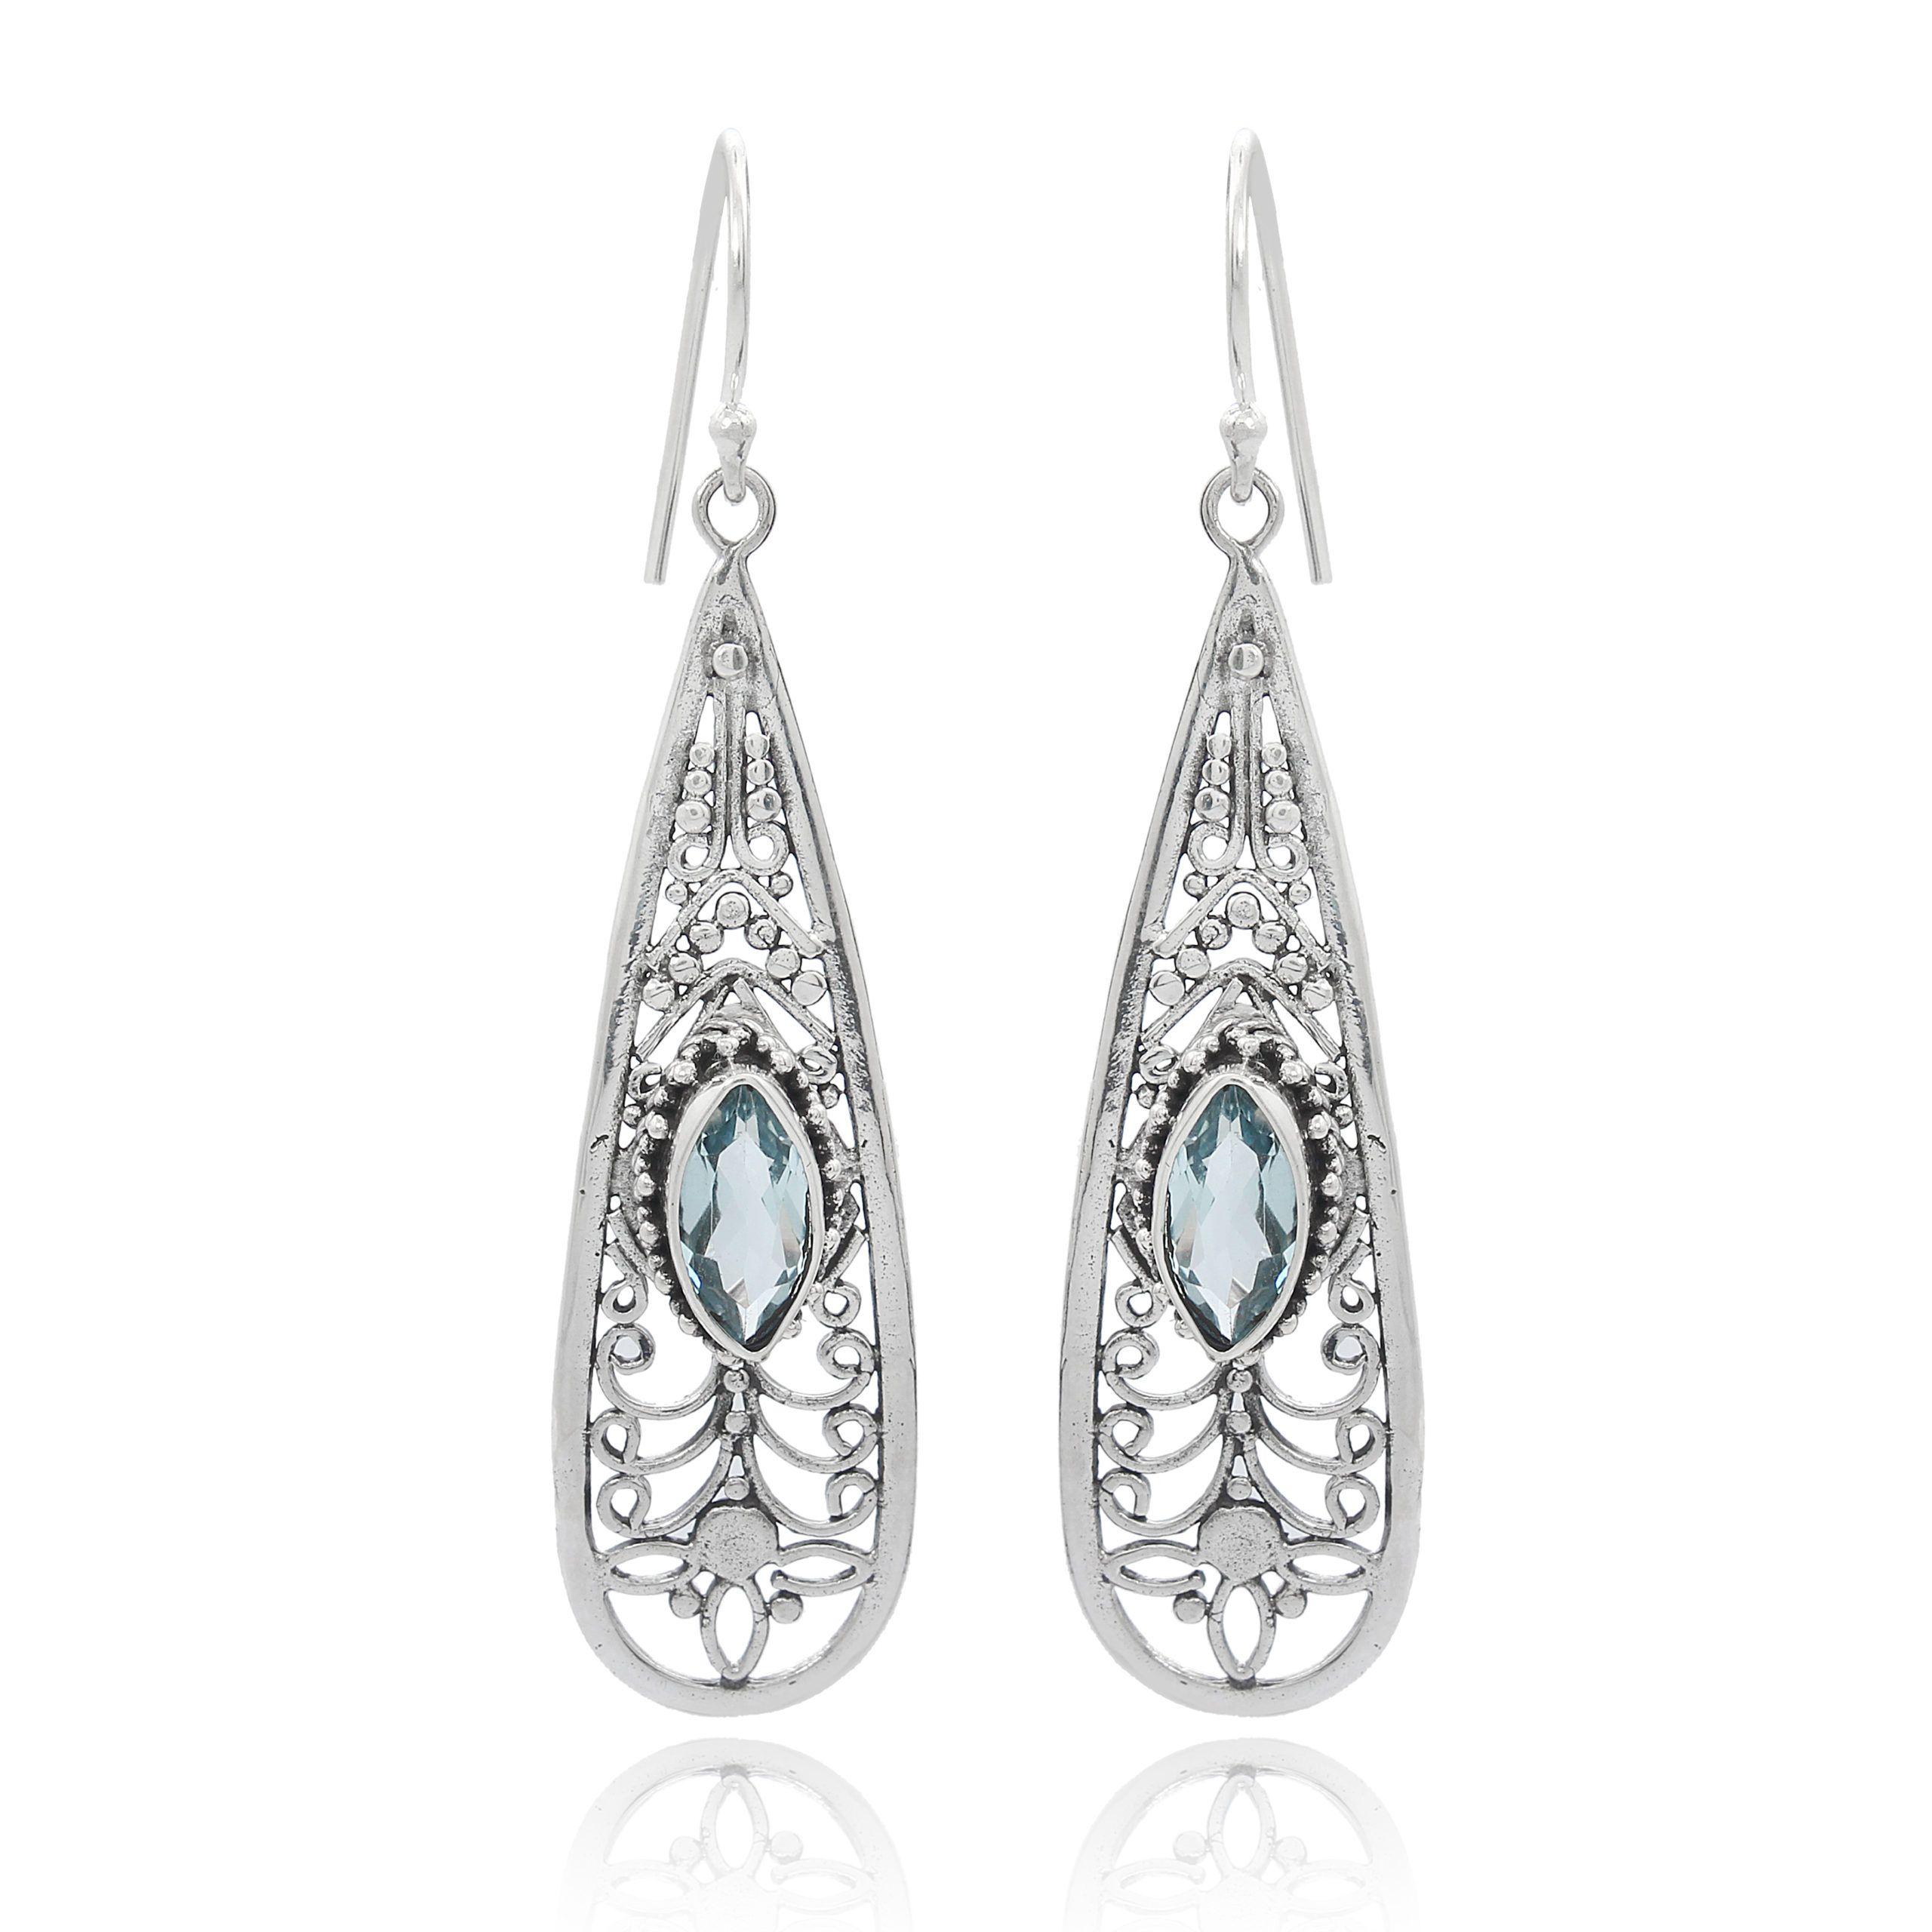 Pendientes largos de plata con topacio azul natural Shadi